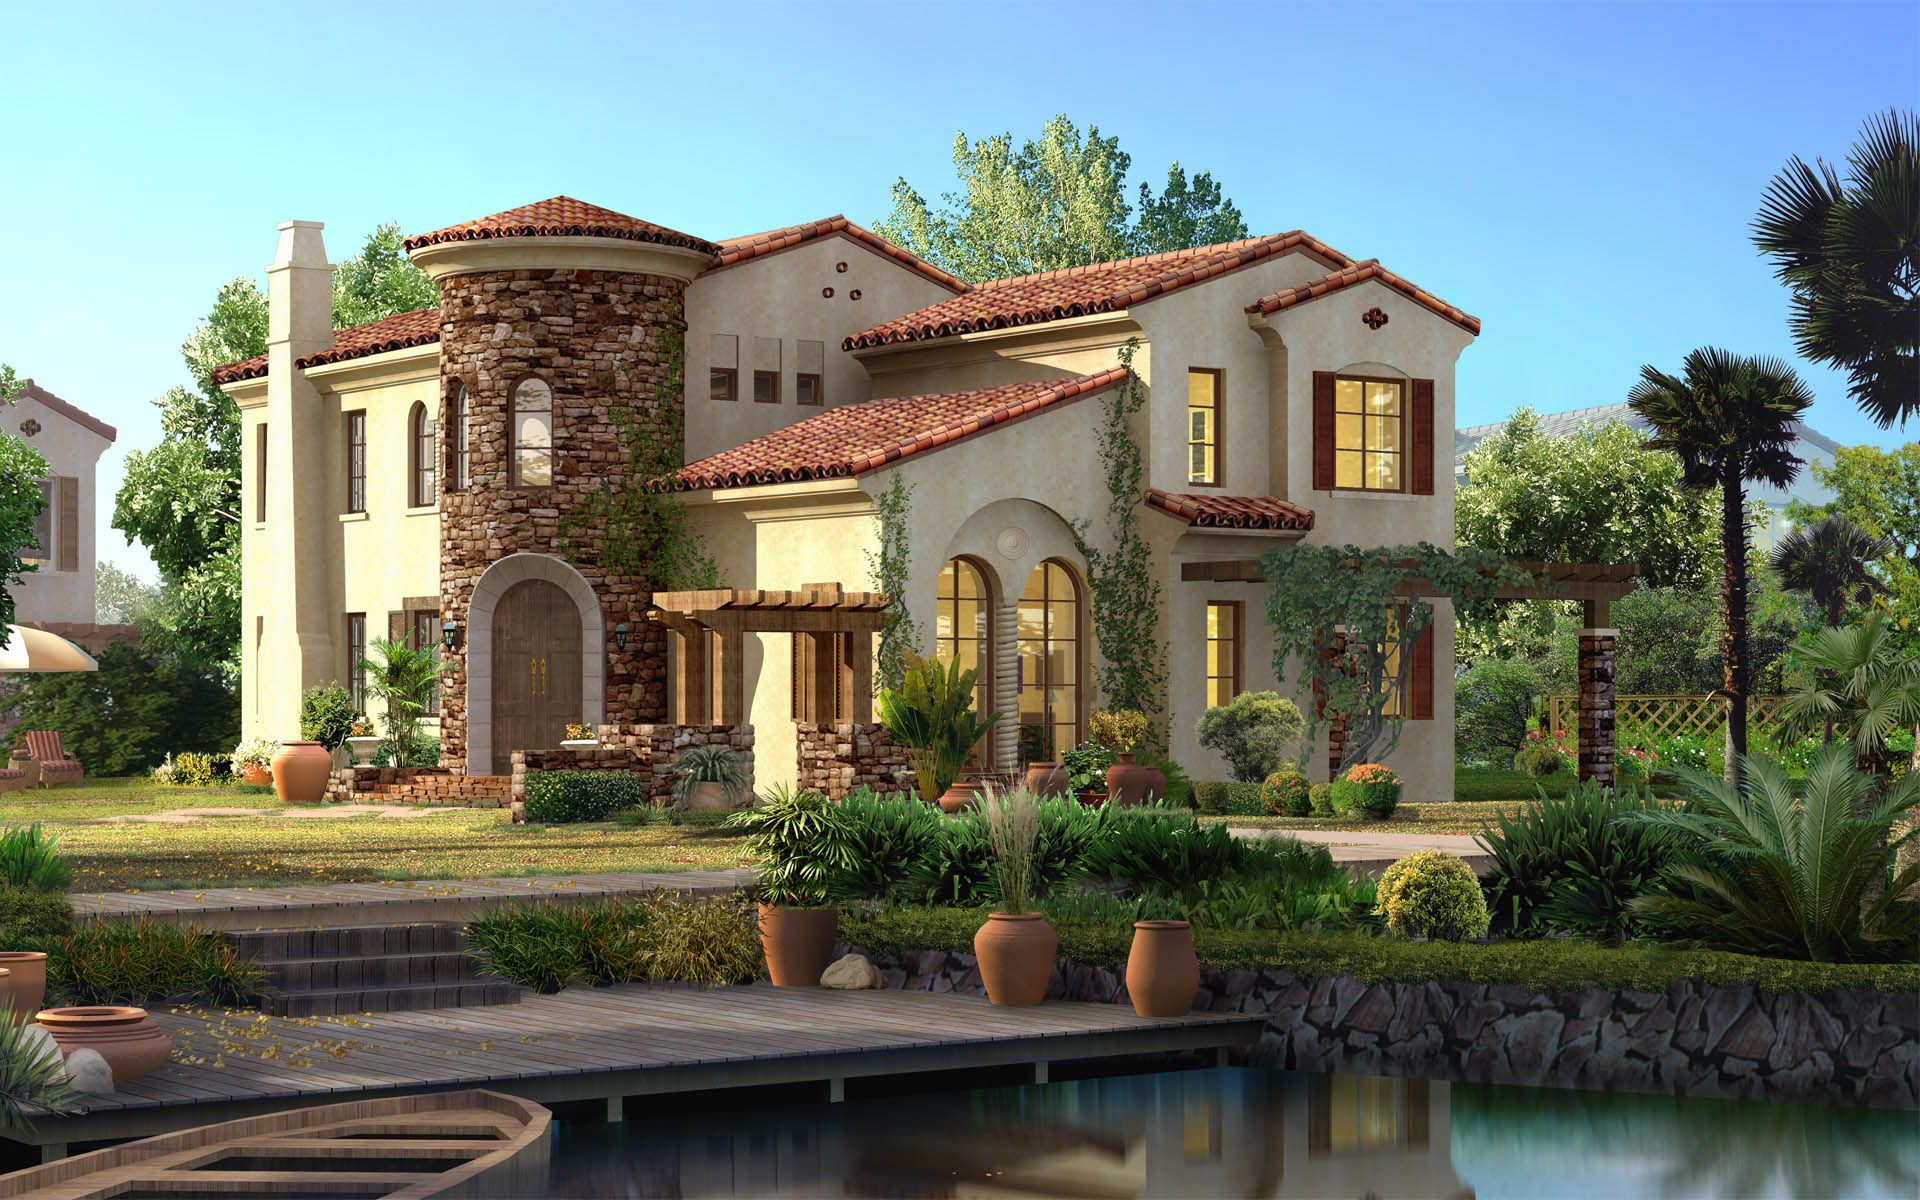 Image detail for -Garden Architecture renderings 7548 - Architectural Landscape Design ...